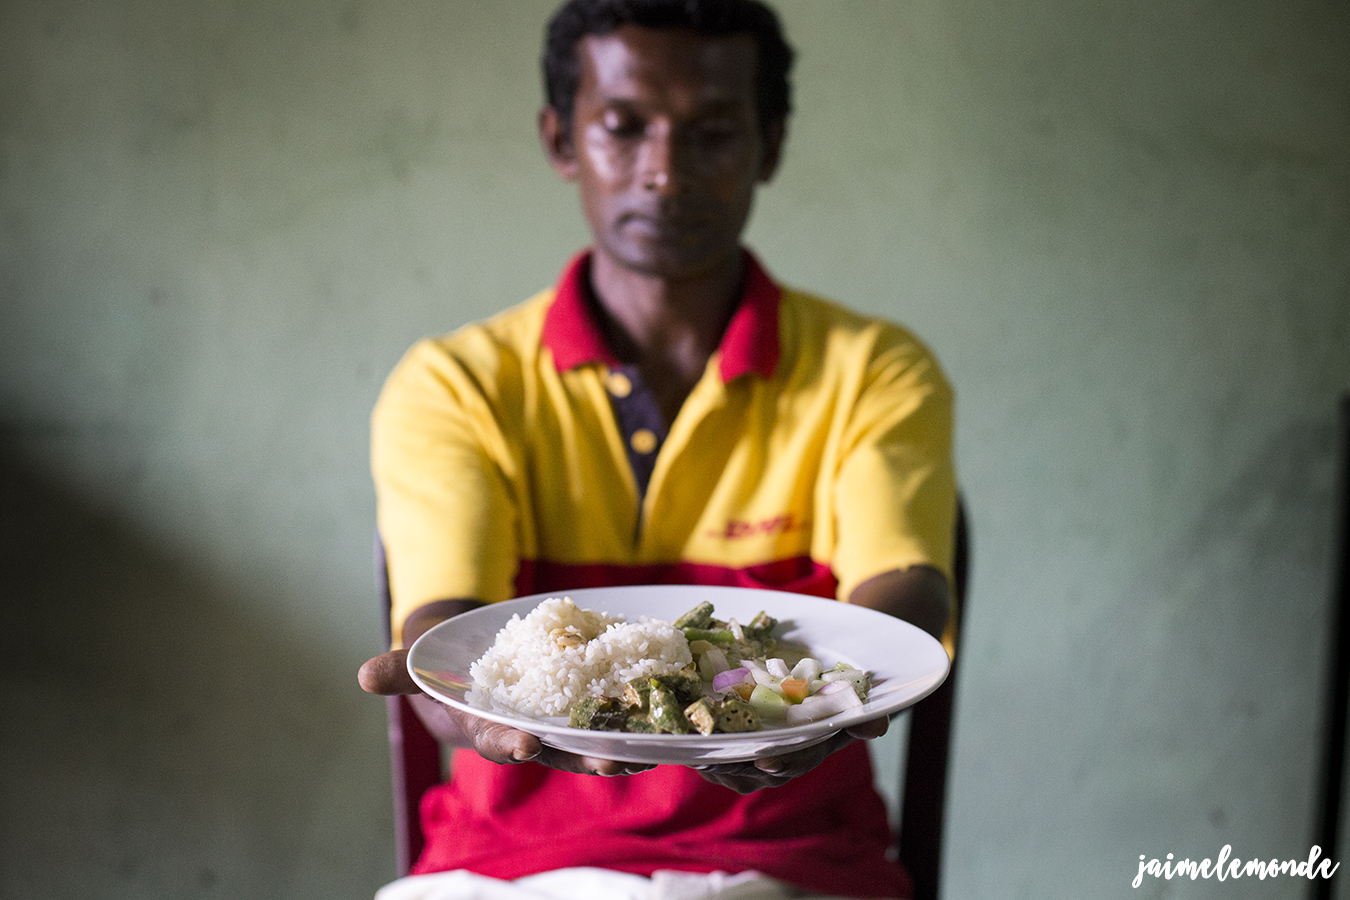 negombo-apprendre-a-cuisiner-avec-ragu-negombo-beach-house-guest-house-voyage-au-sri-lanka-jaimelemonde-16